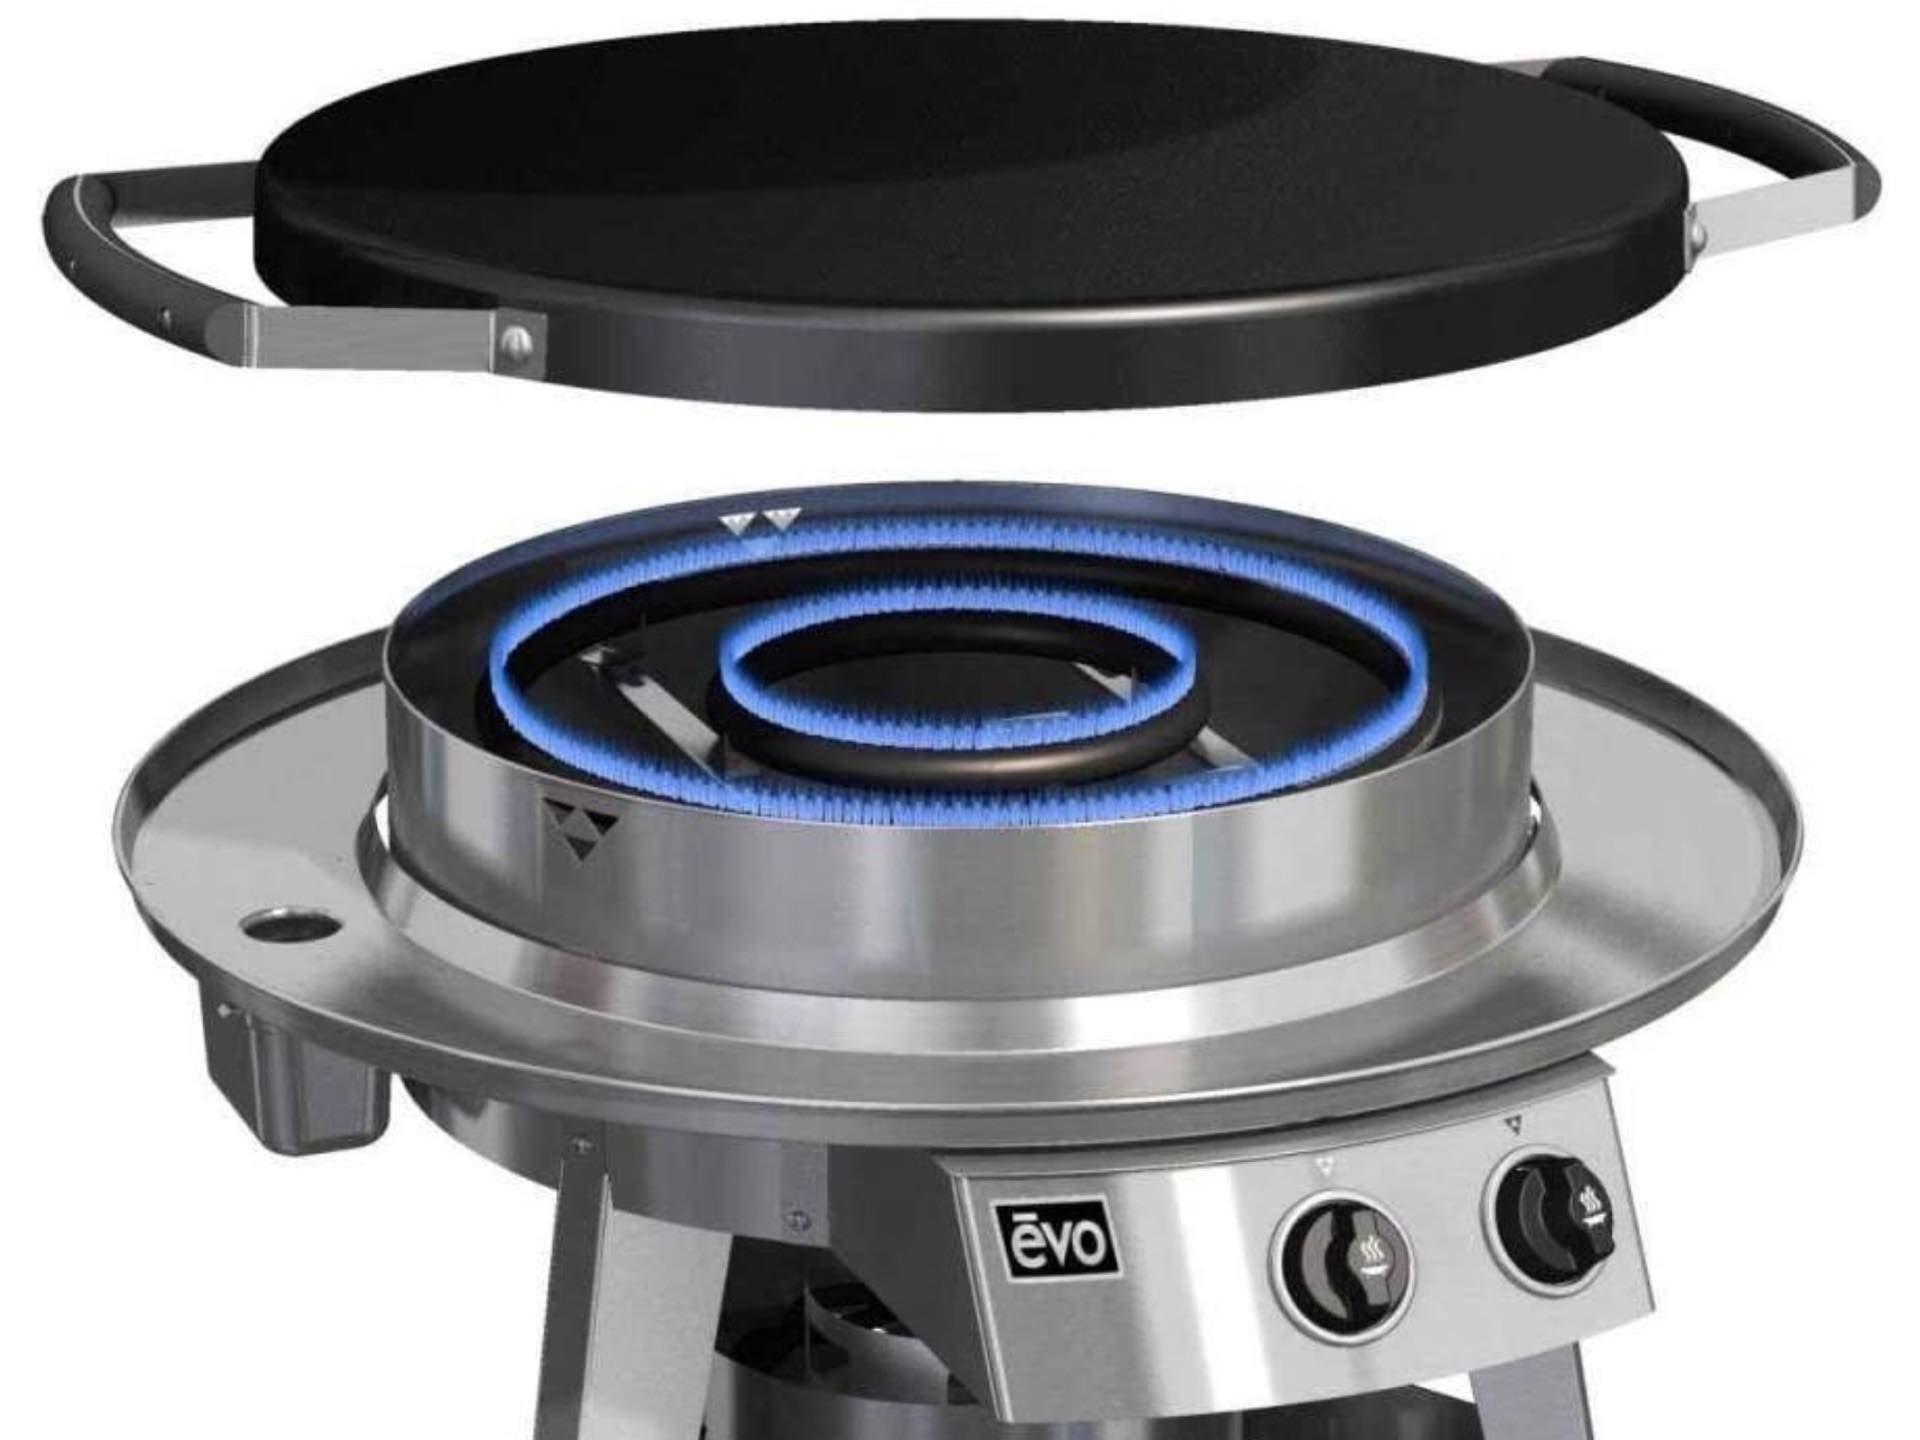 evo-flattop-grill-burner-rings